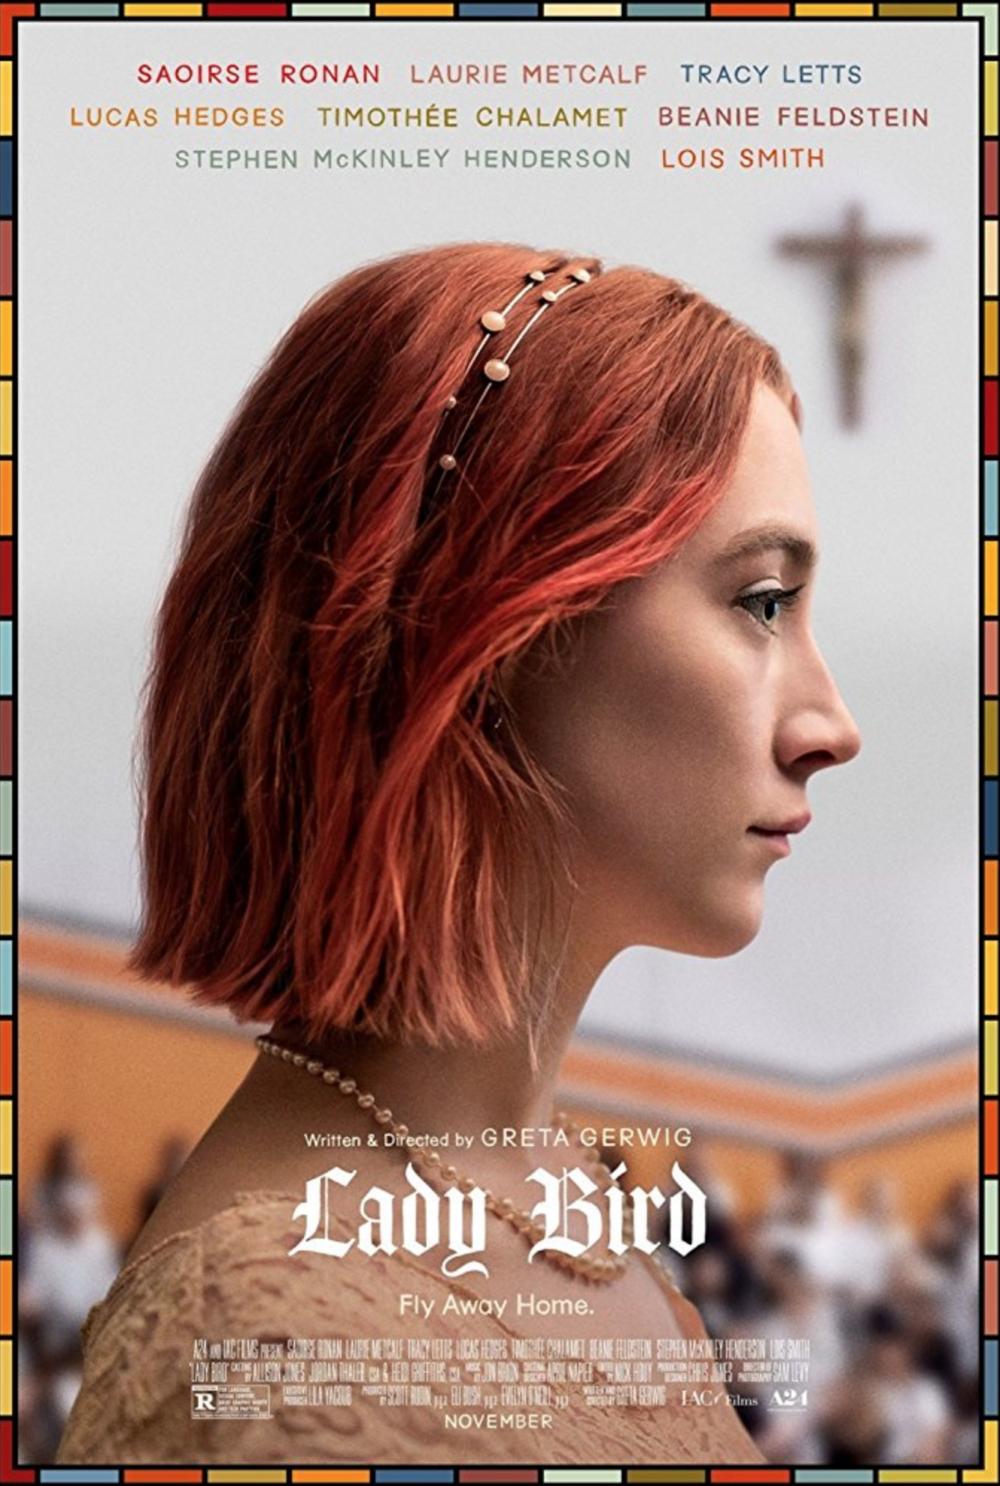 Lady Bird film review - Bossladies Magazine